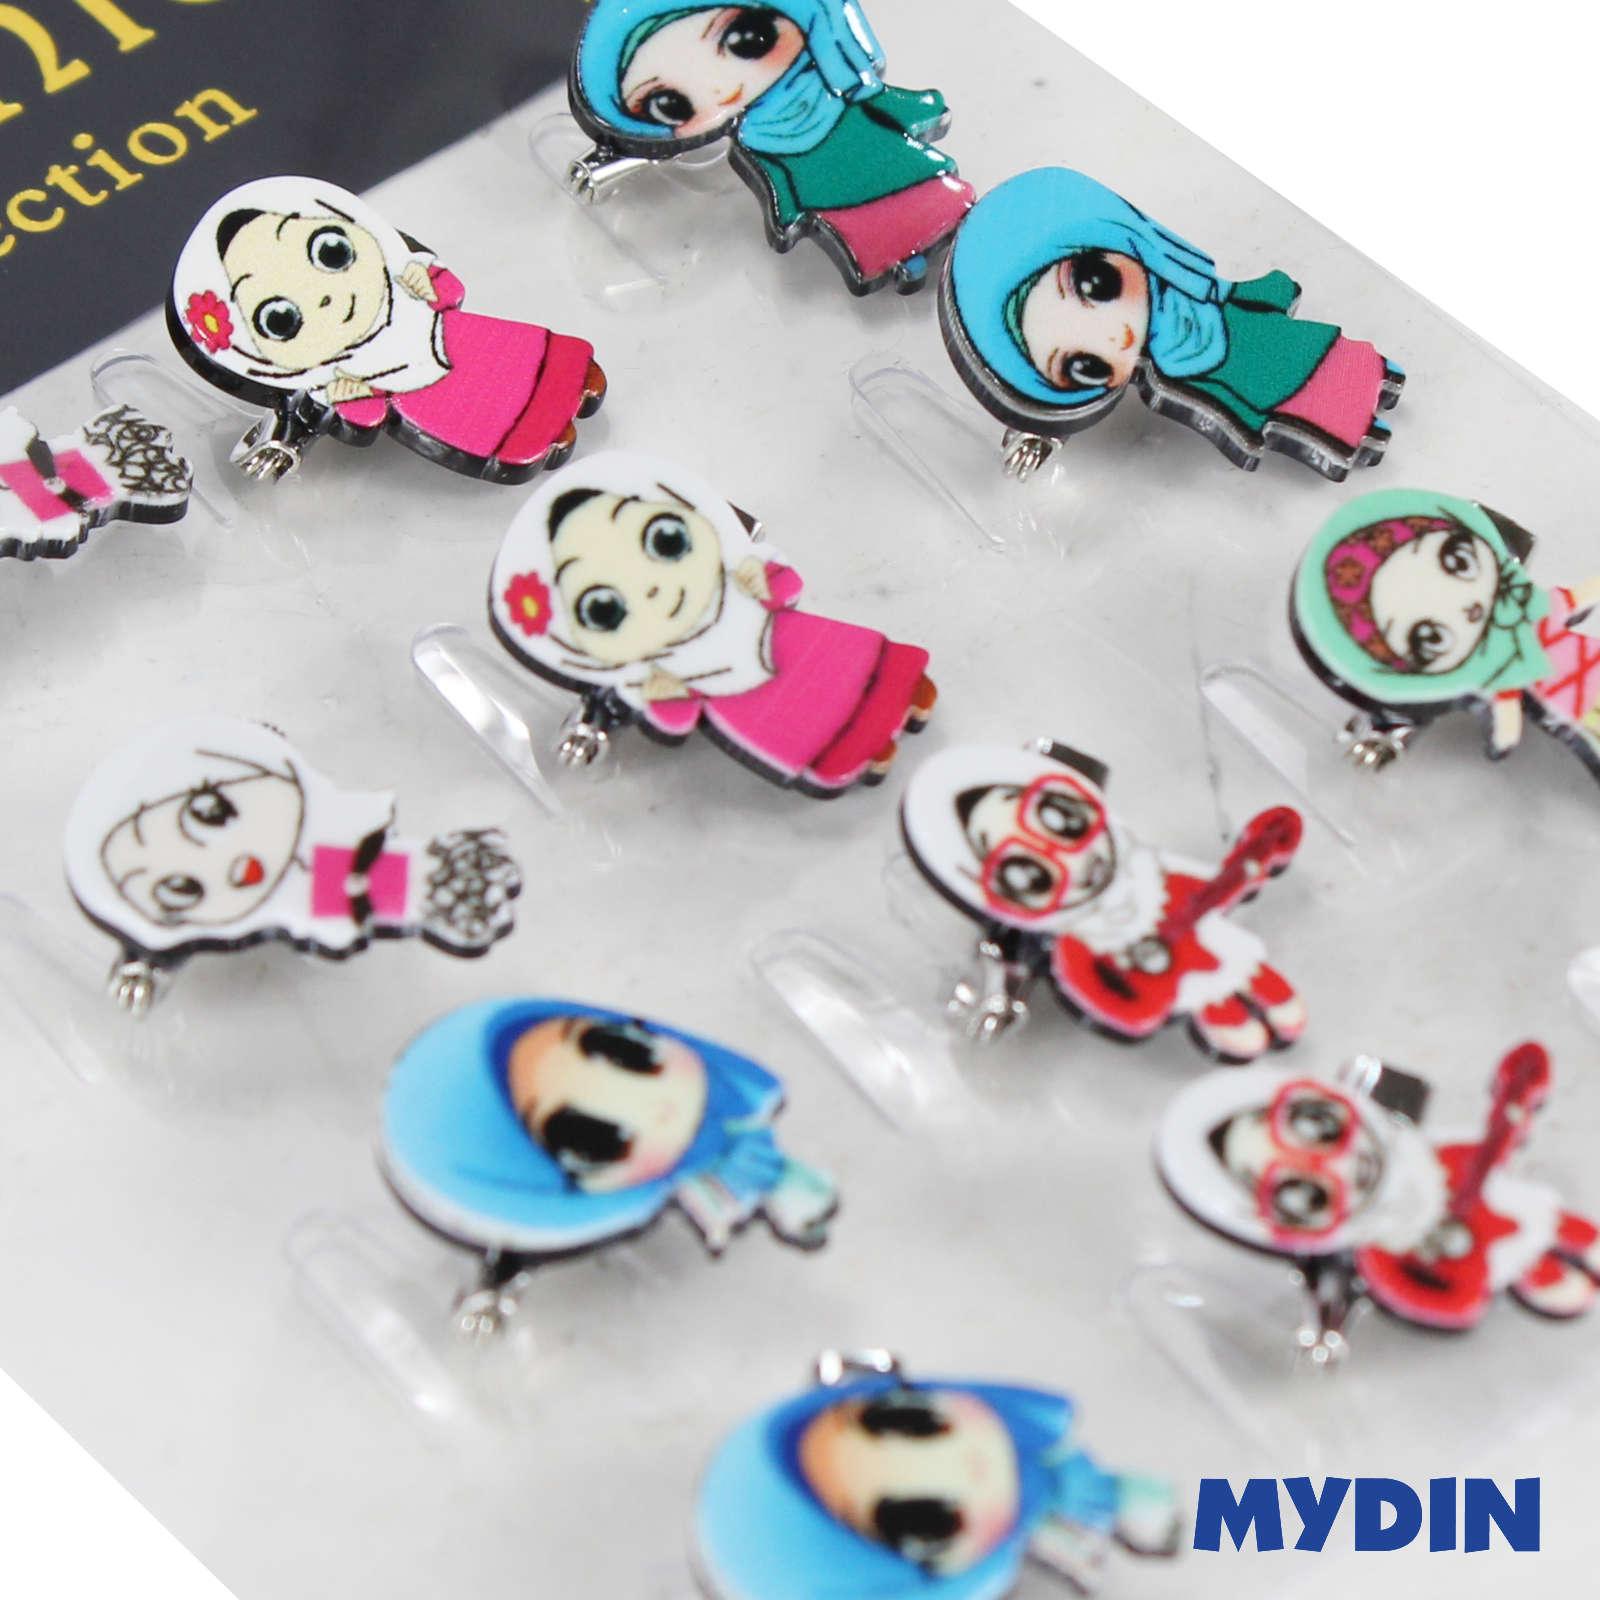 Assorted Tini Mini Muslimah 0820ABCPD6D-9-04 (12pcs) #DesignD